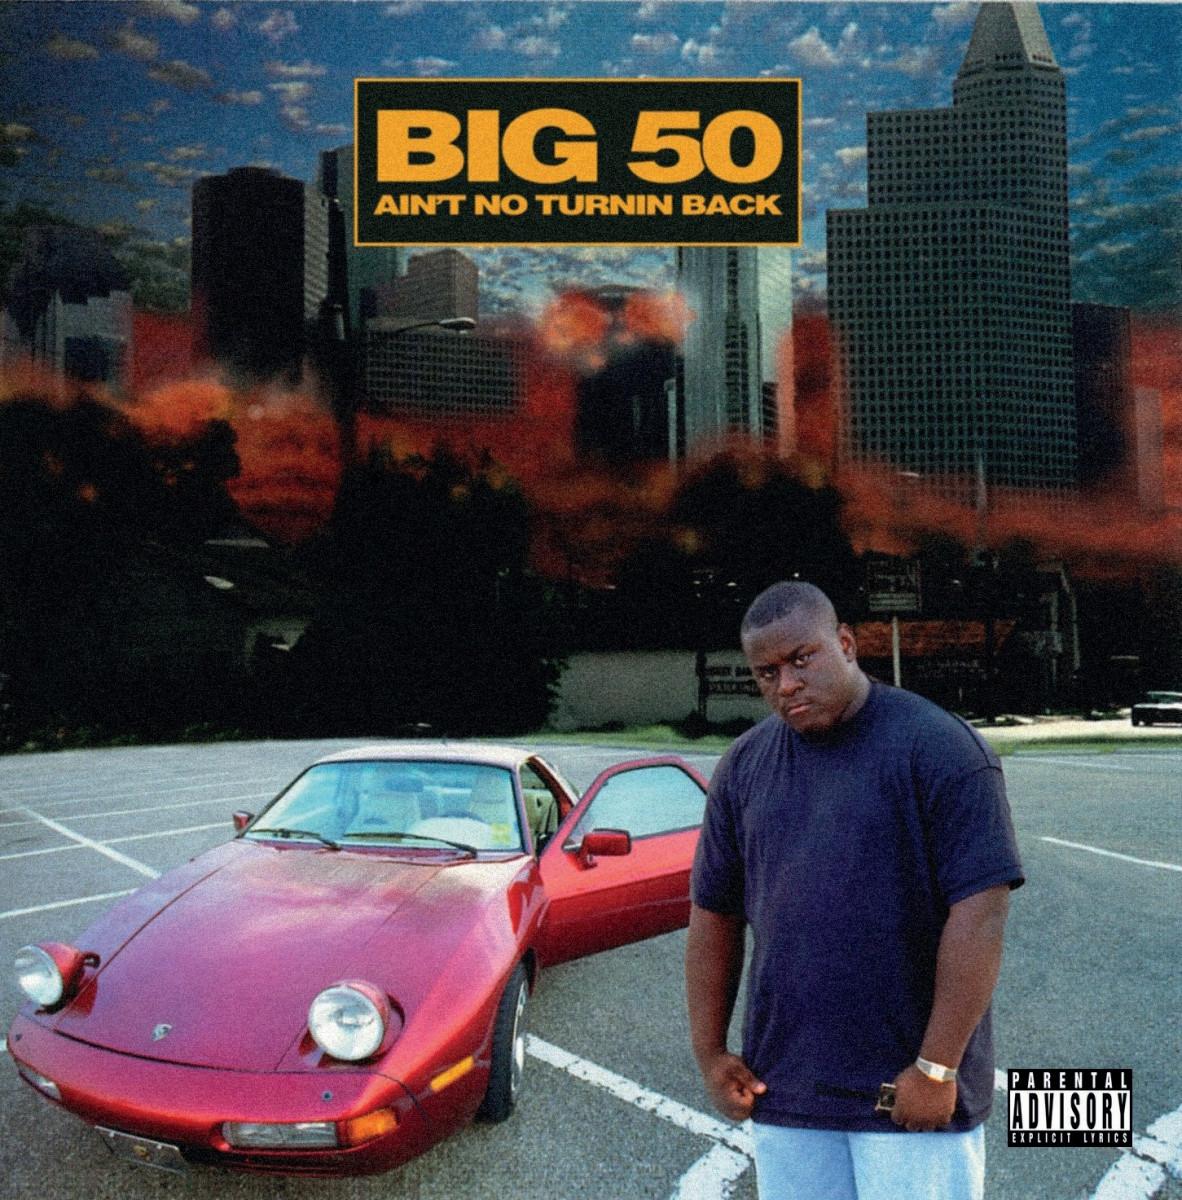 Big 50 — «Ain't No Turnin Back»